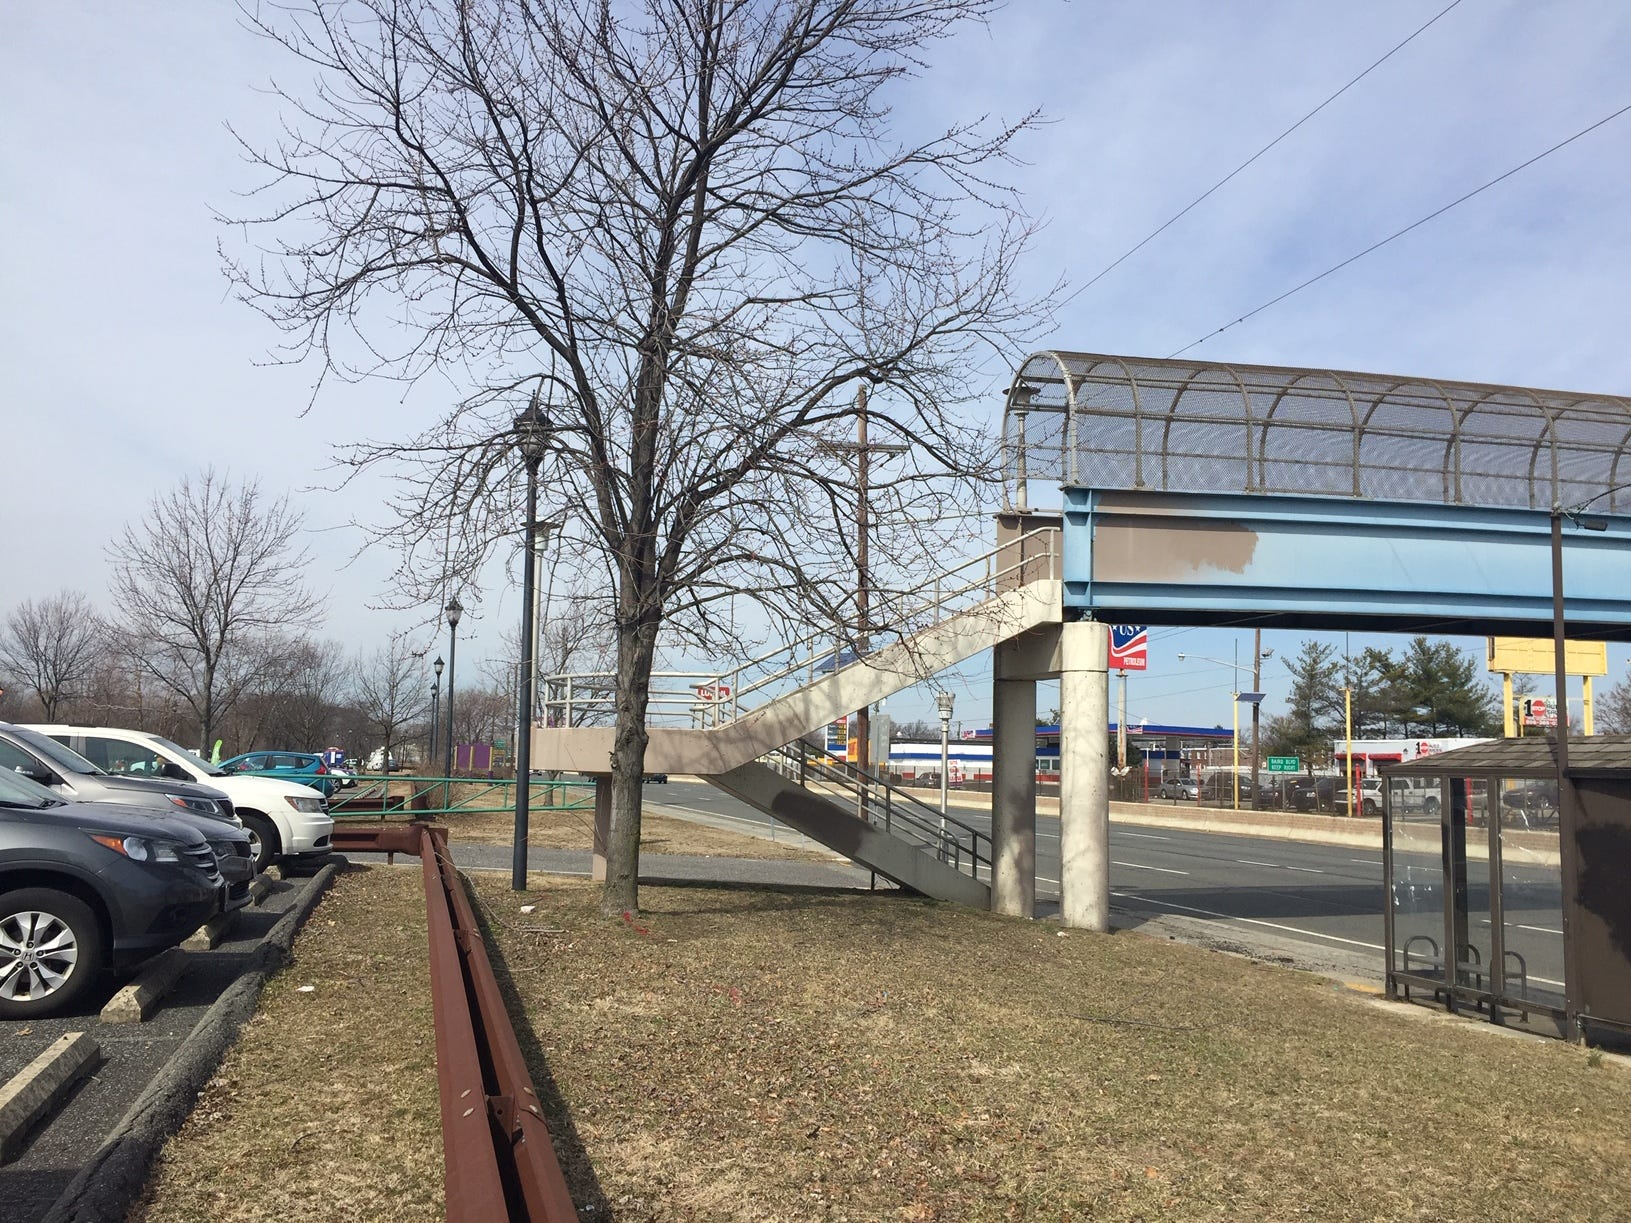 A pedestrian walkway provides access  over Admiral Boulevard into Gateway Park on the border of Pennsauken and Camden. Baird Boulevard also allows  access